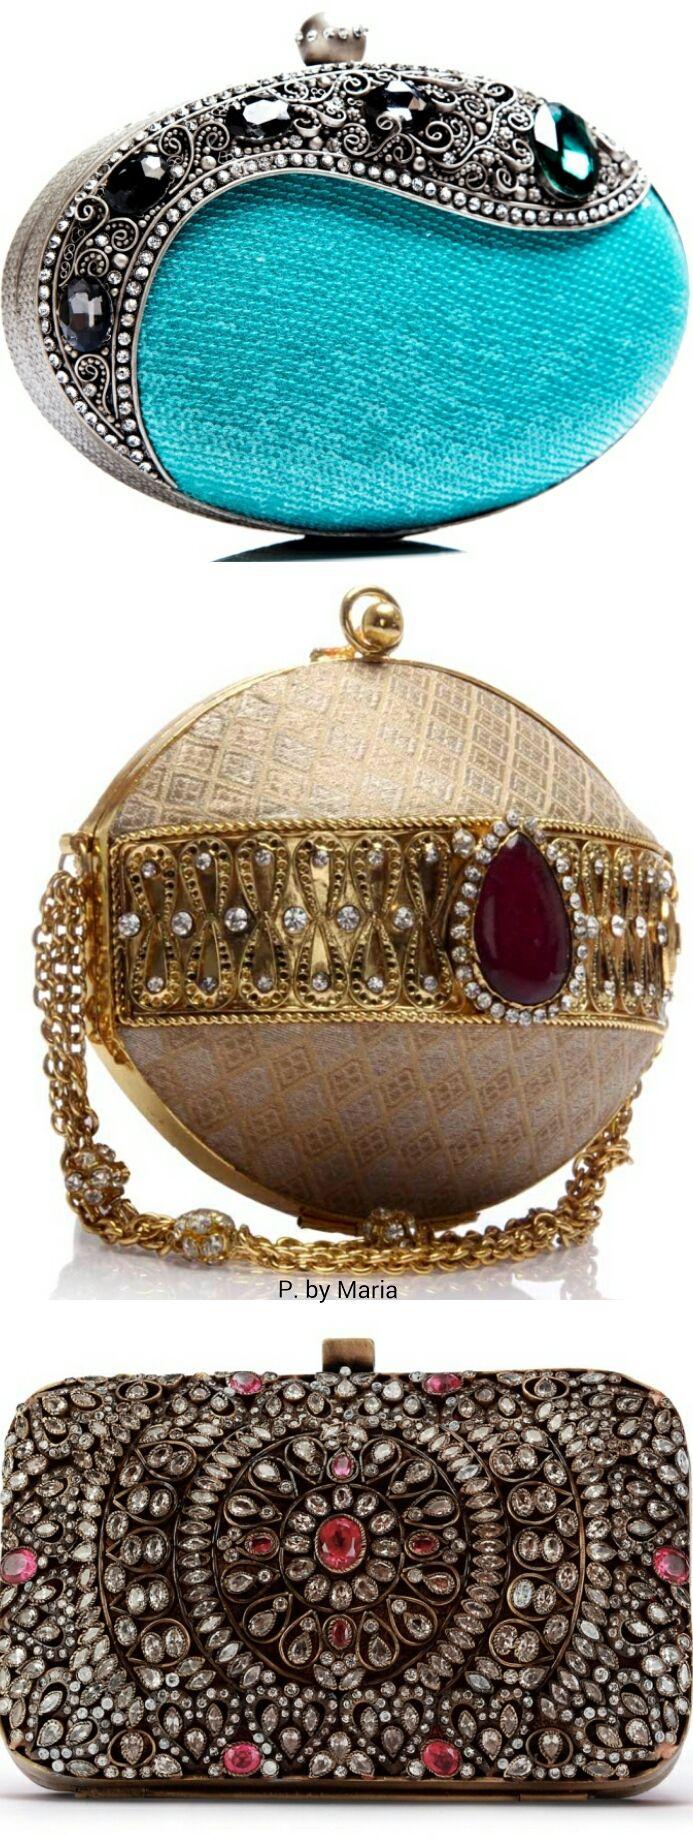 Fashion Accessories | Clutches | Rosamaria G Frangini || Meera Mahadevia | Clutch Bags